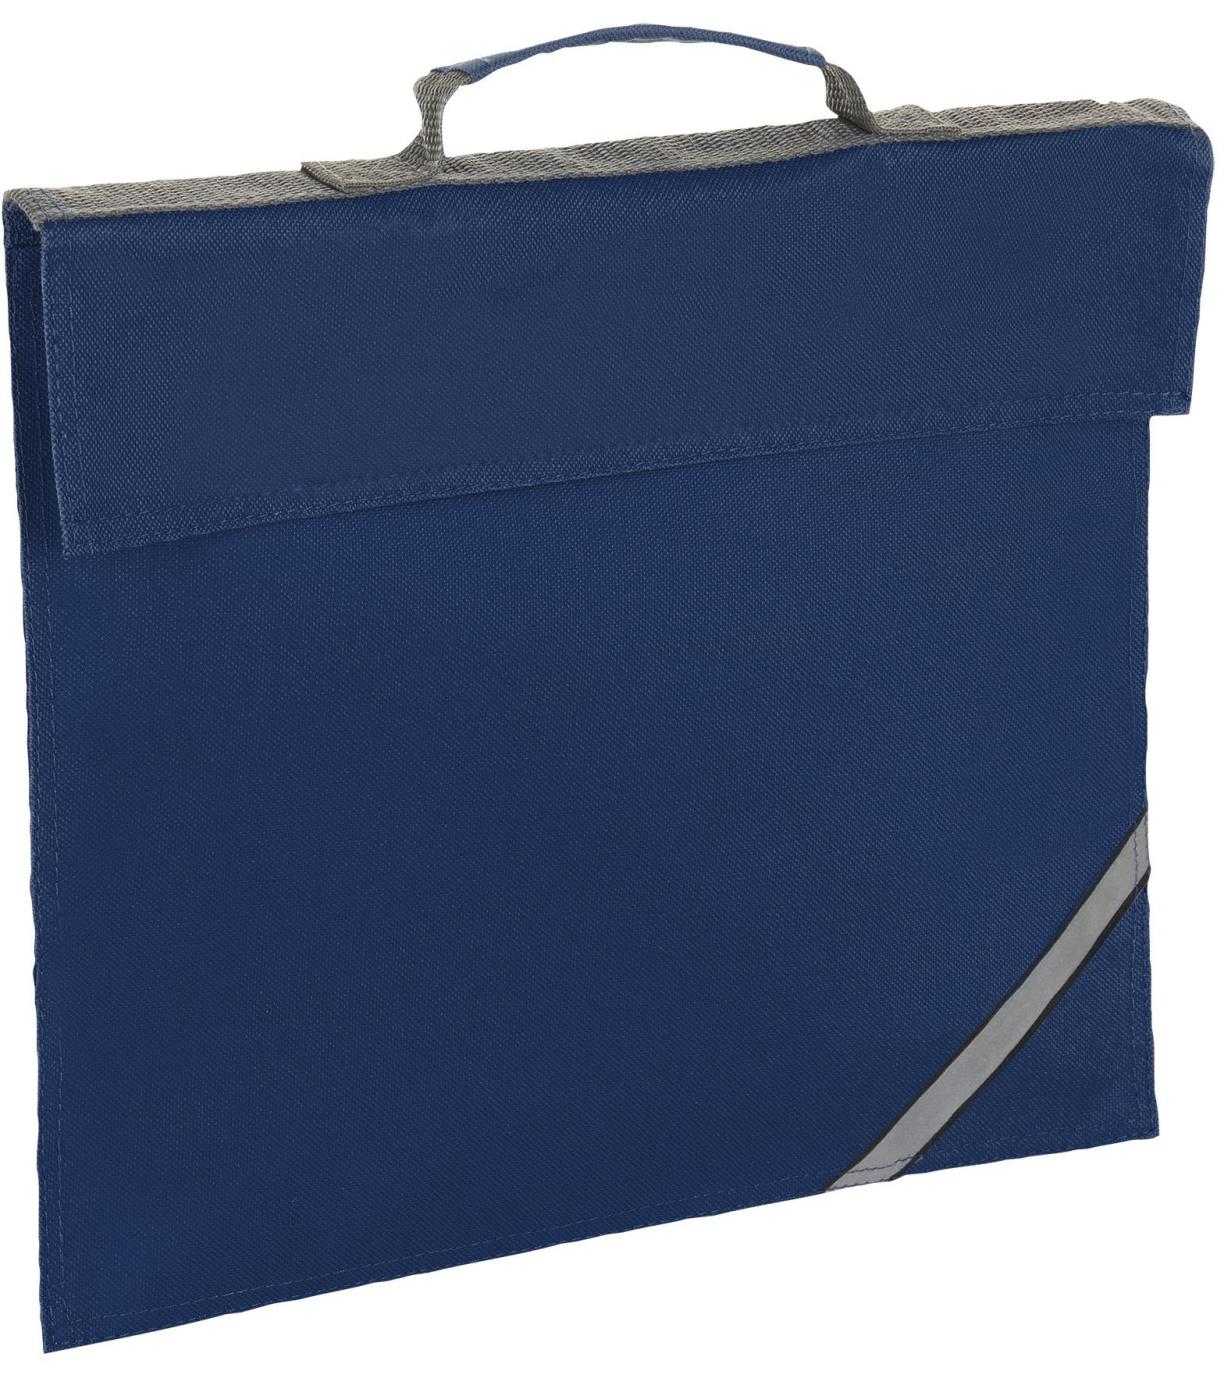 SOĽS Taška na doklady A4 OXFORD 01670319 Námořní modrá TUN